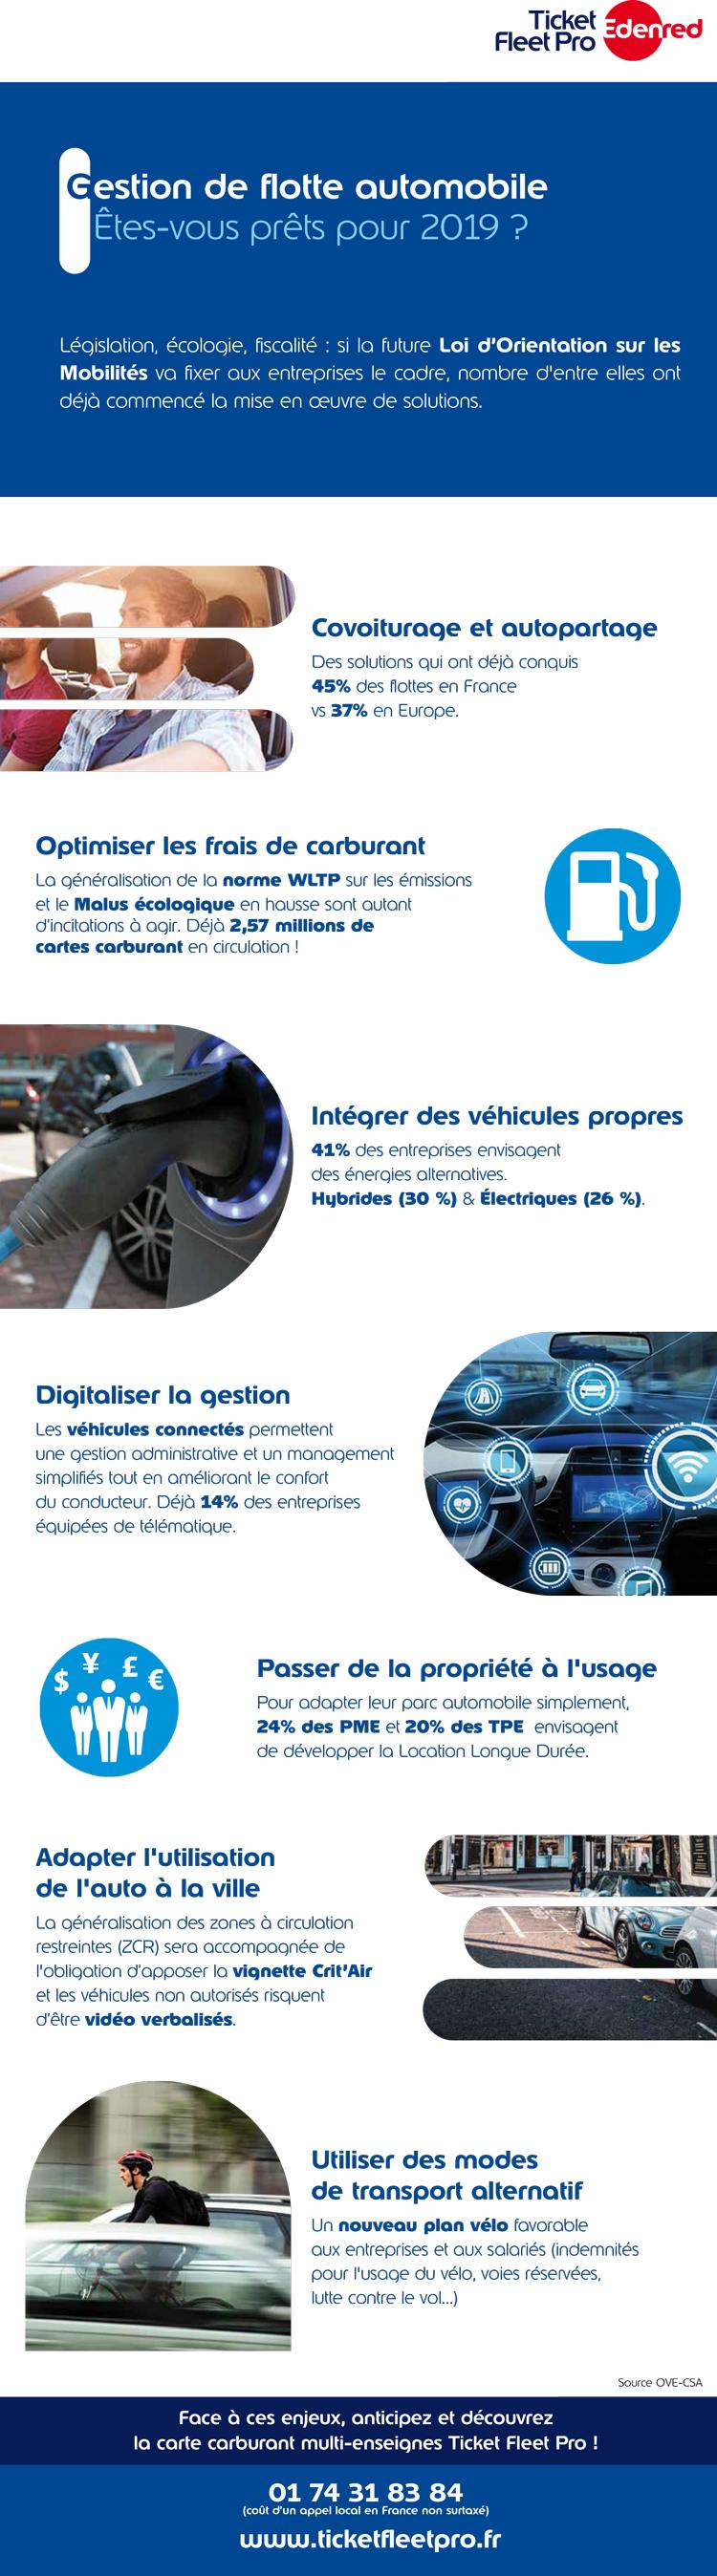 Edenred-Infographie-Flotte-Auto